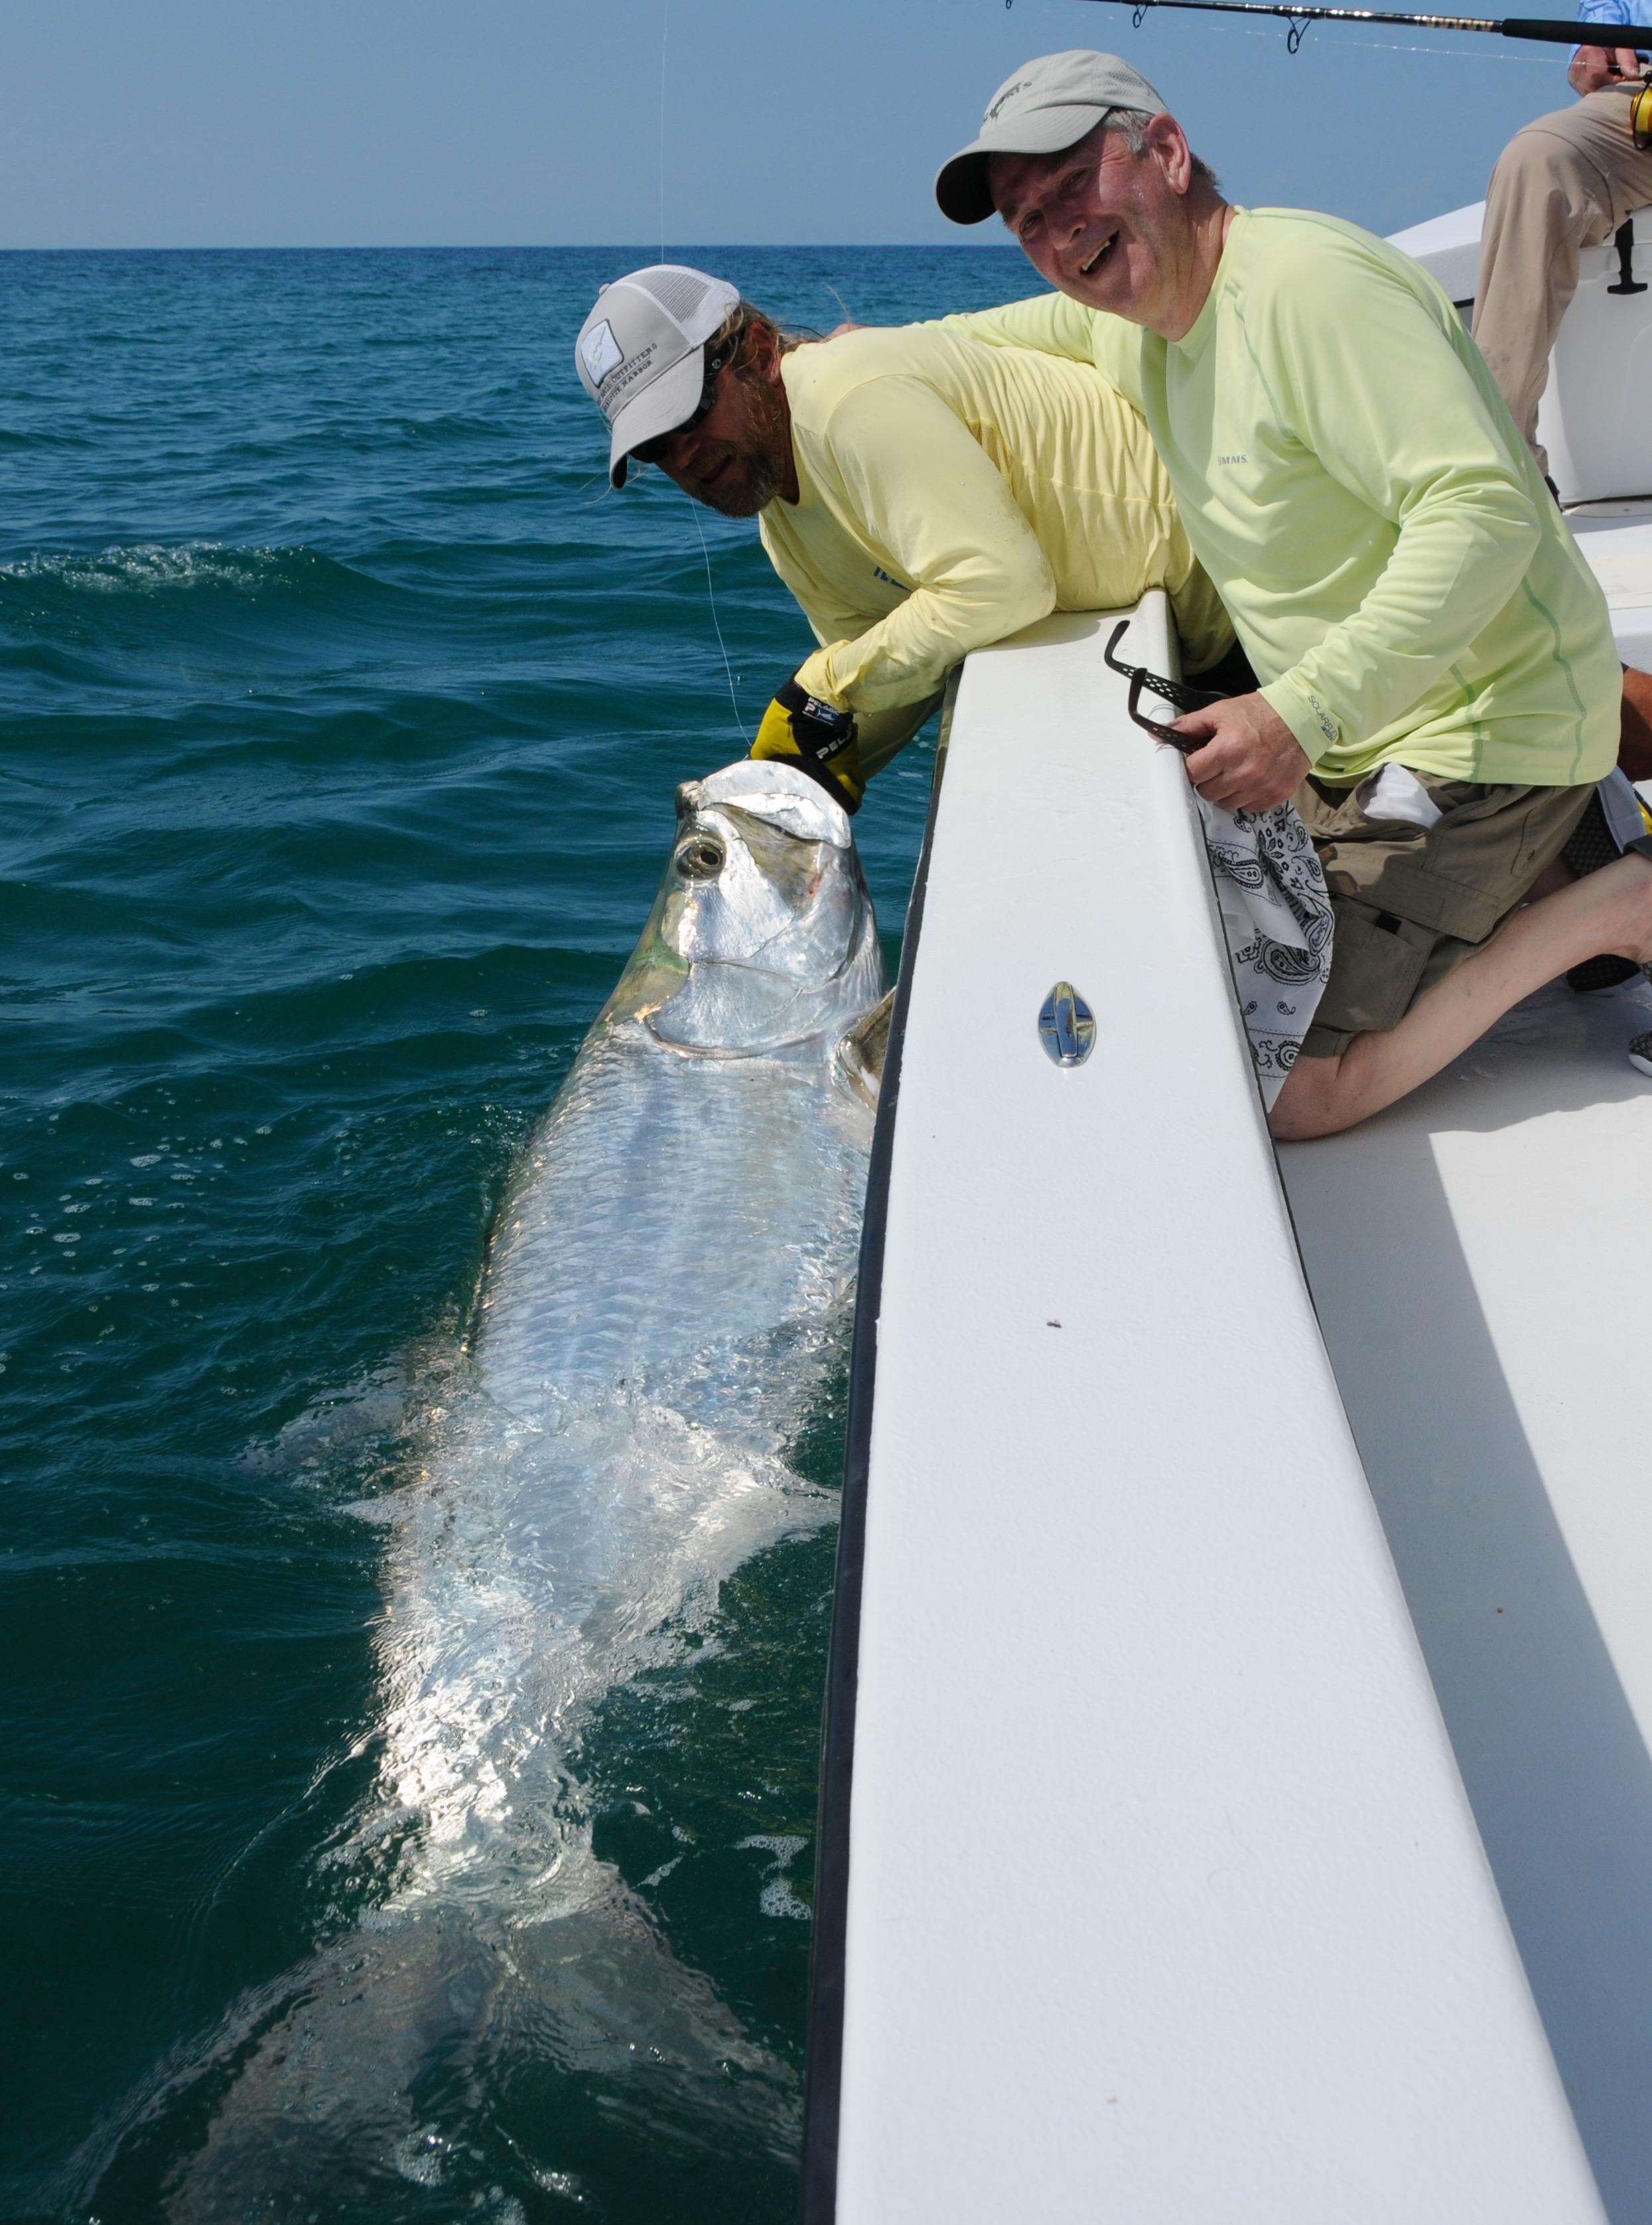 Fort myers tarpon fishing chartersft myers tarpon fishing for Fort myers florida fishing